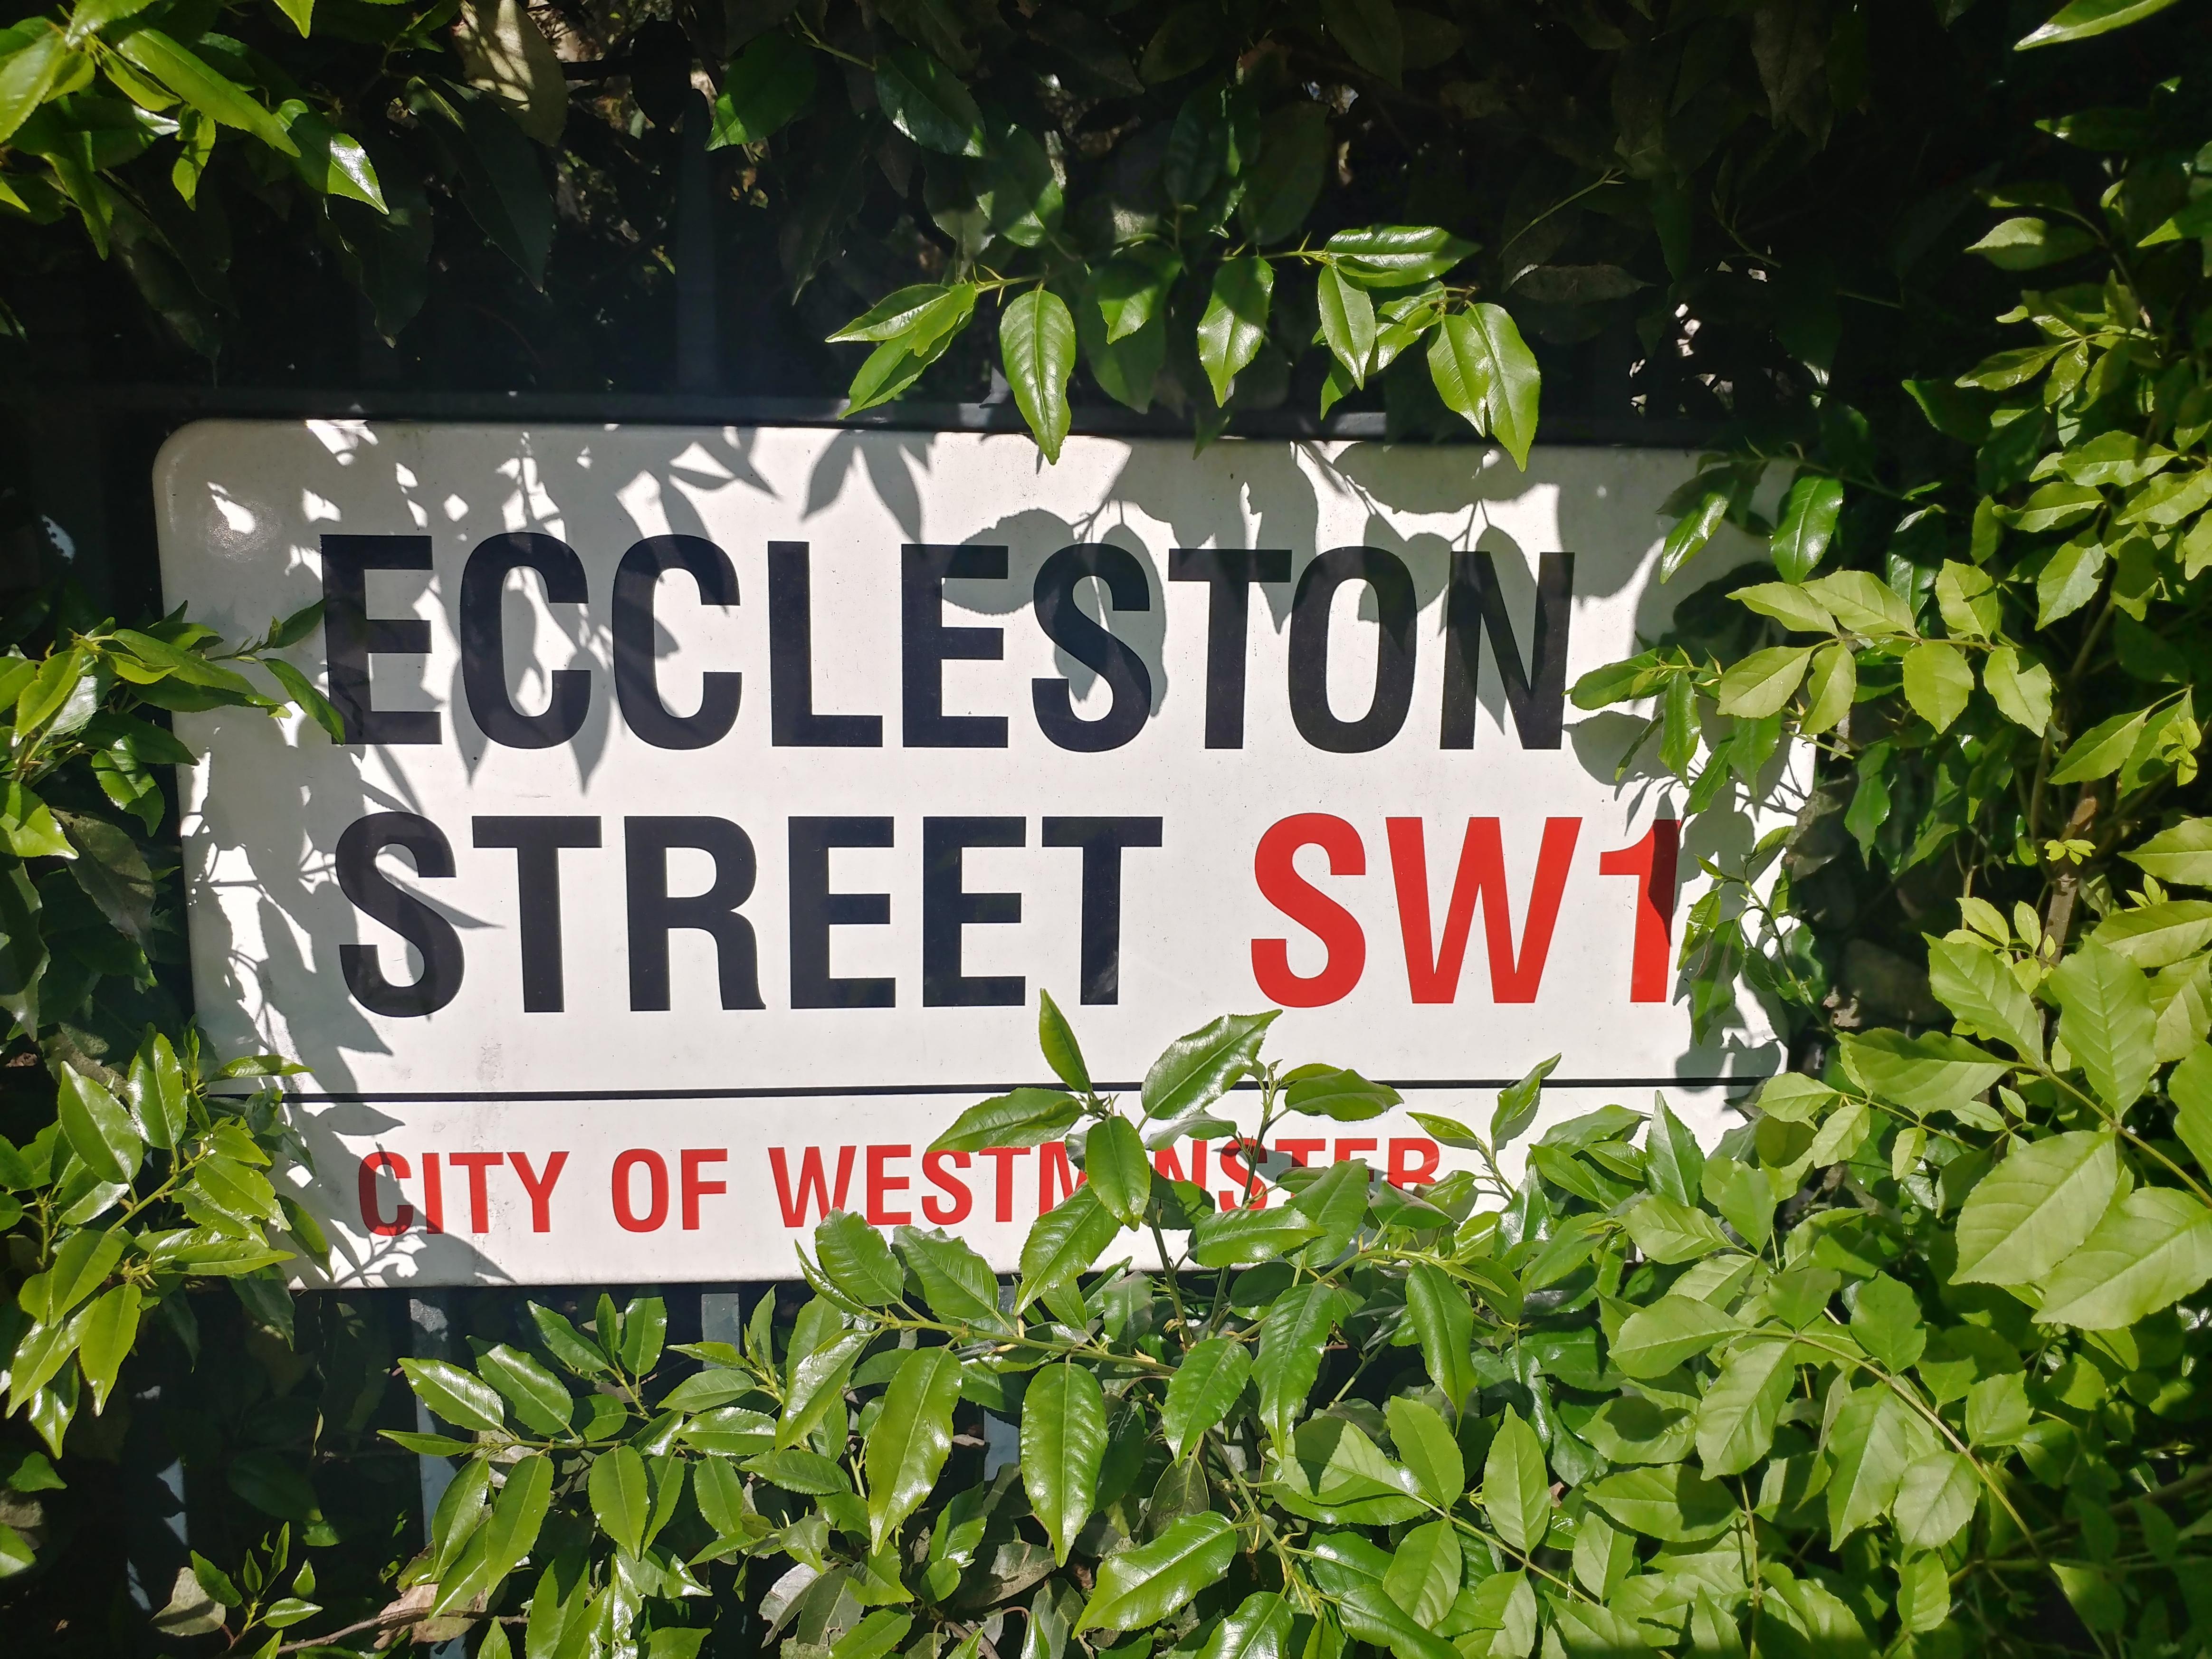 Eccleston St at Chester Square